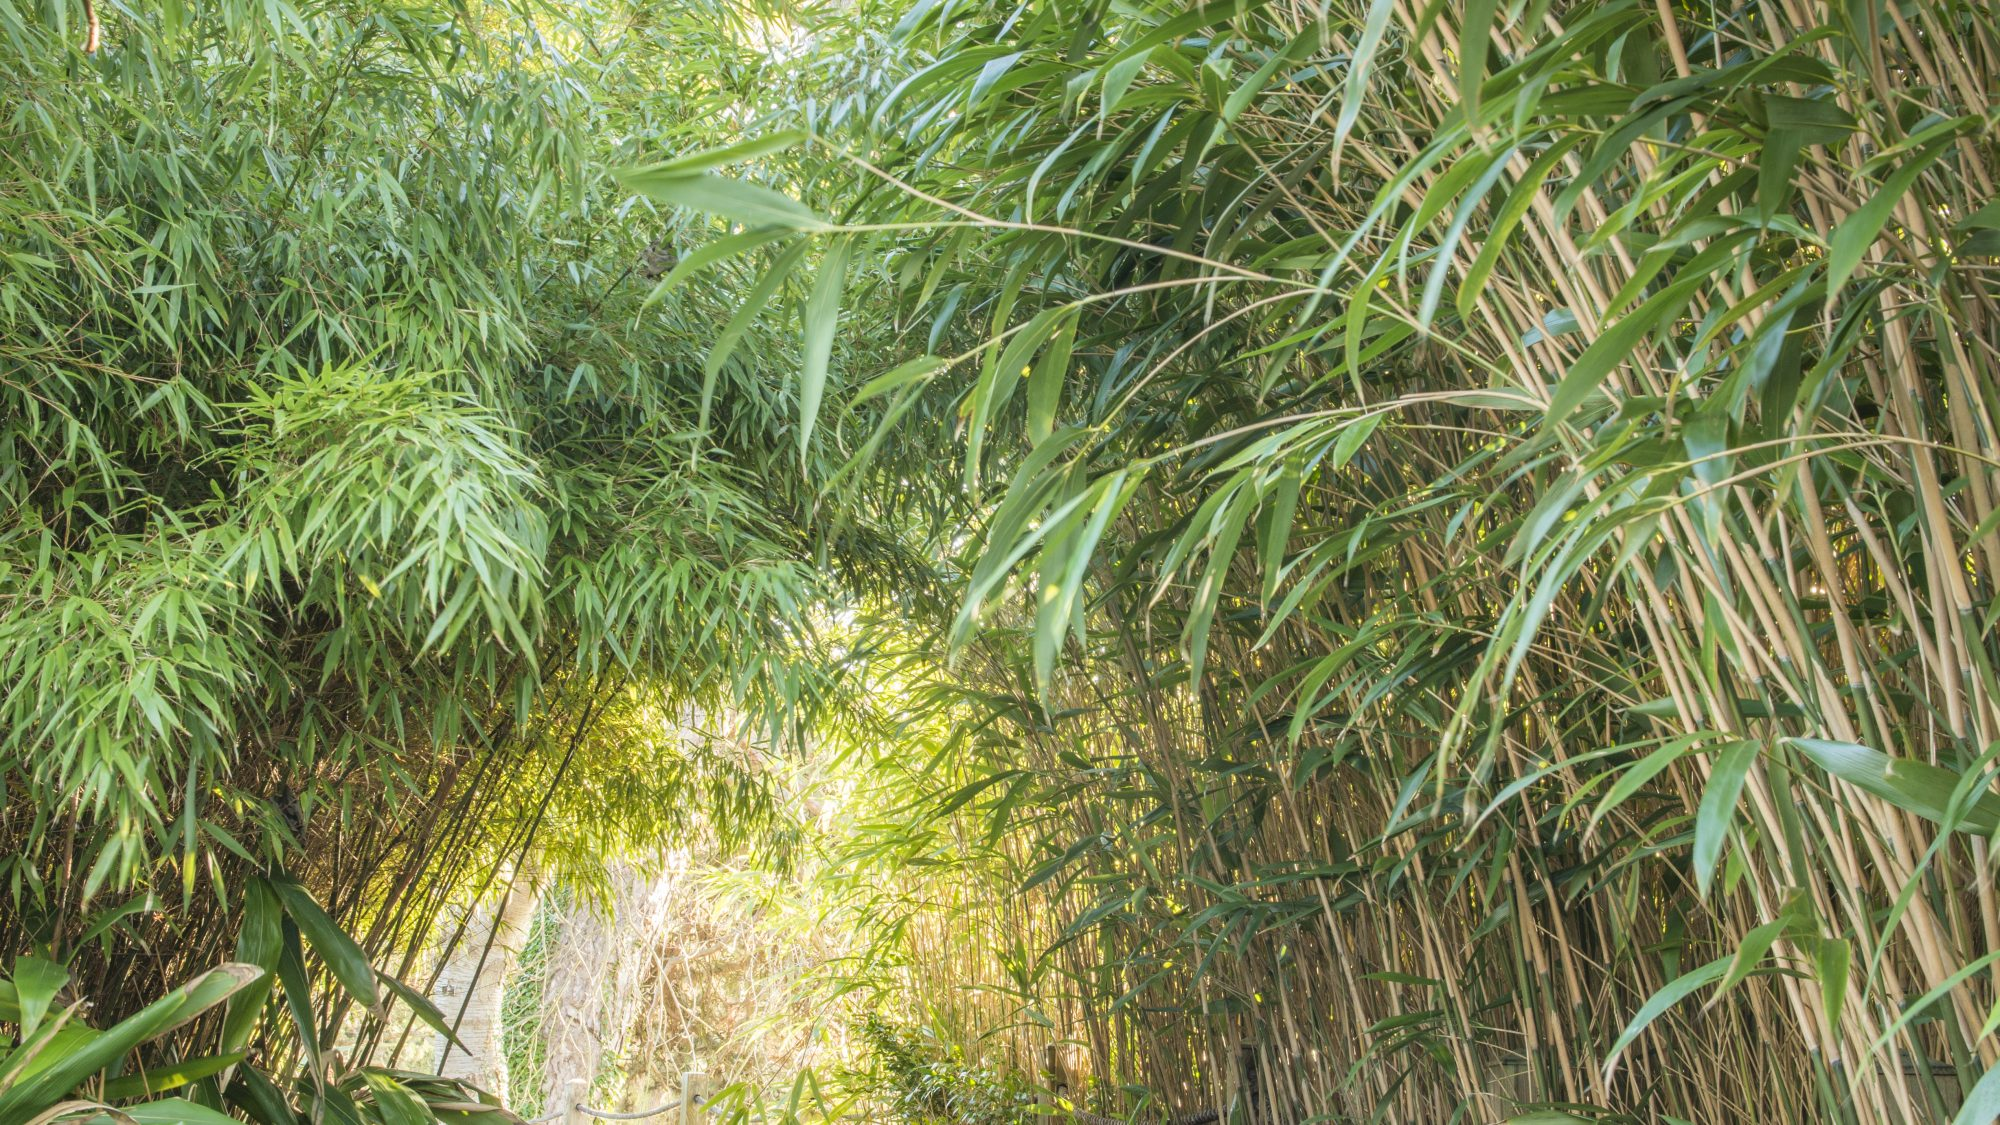 Bamboo in the Bog Garden.